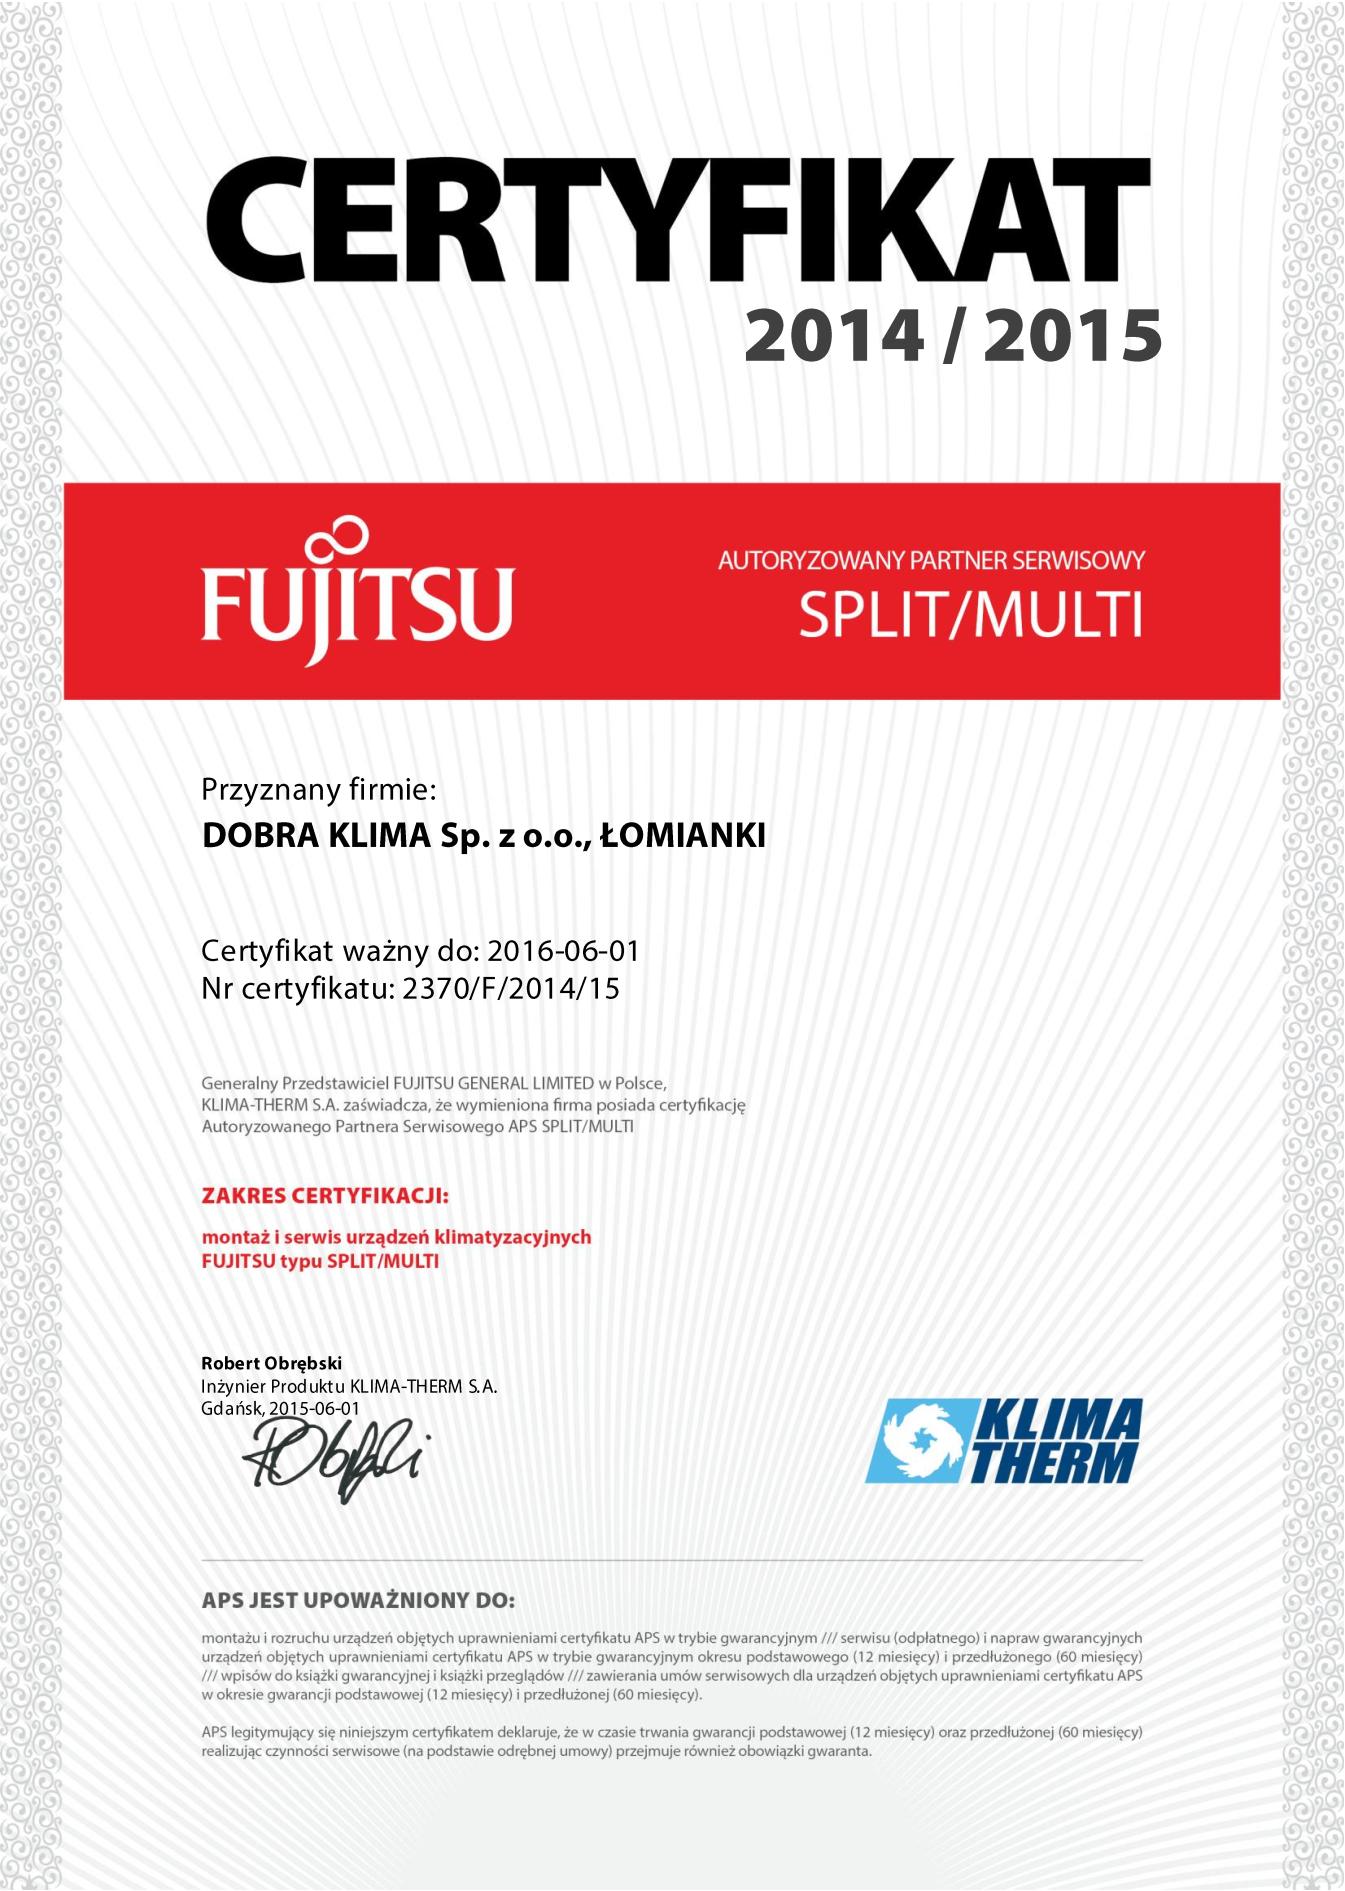 2014-certyfikat-fujitsu3